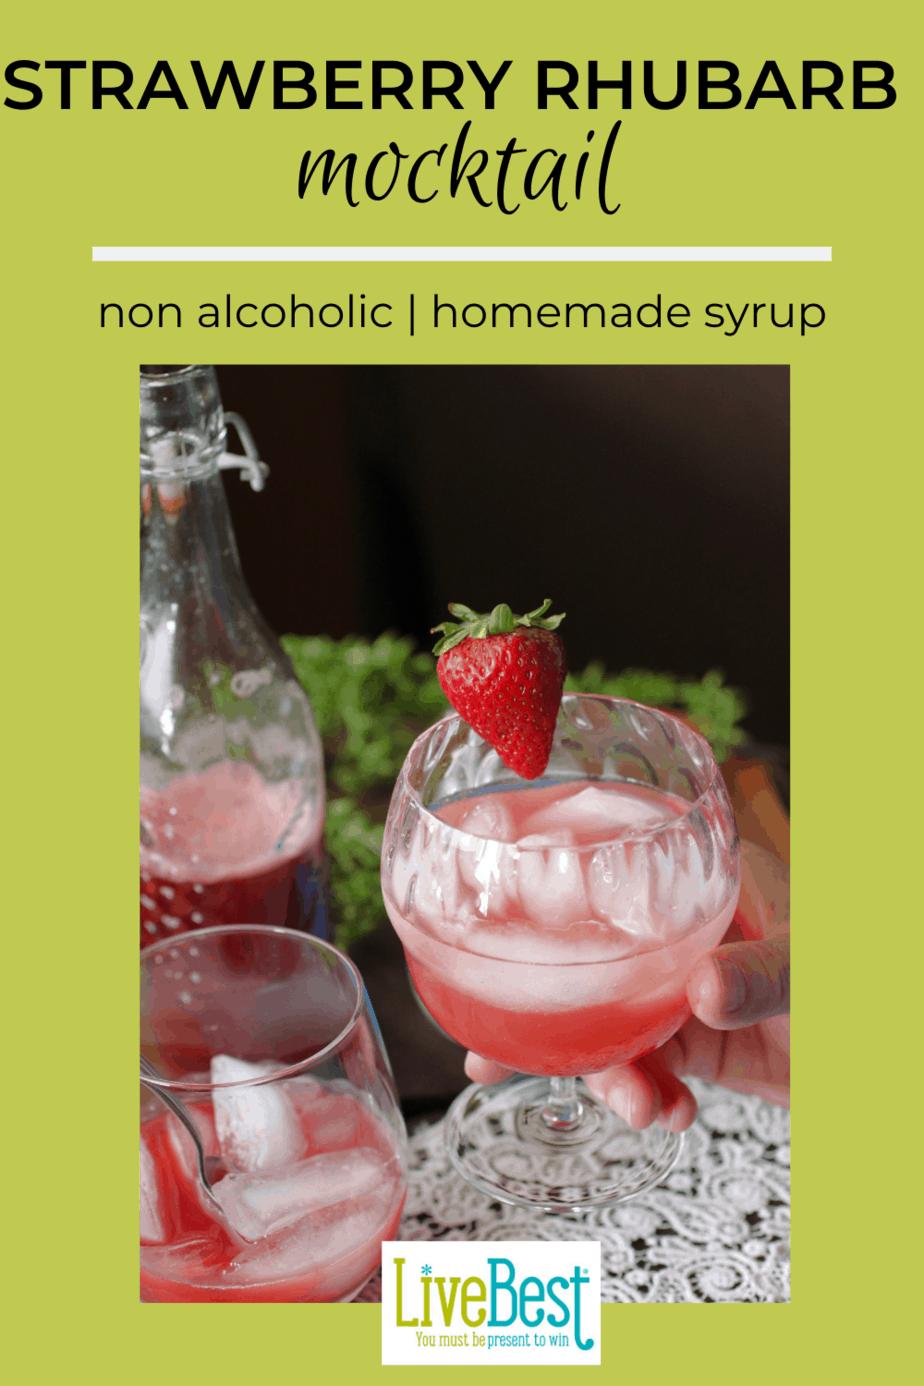 strawberry rhubarb mocktail in a glass